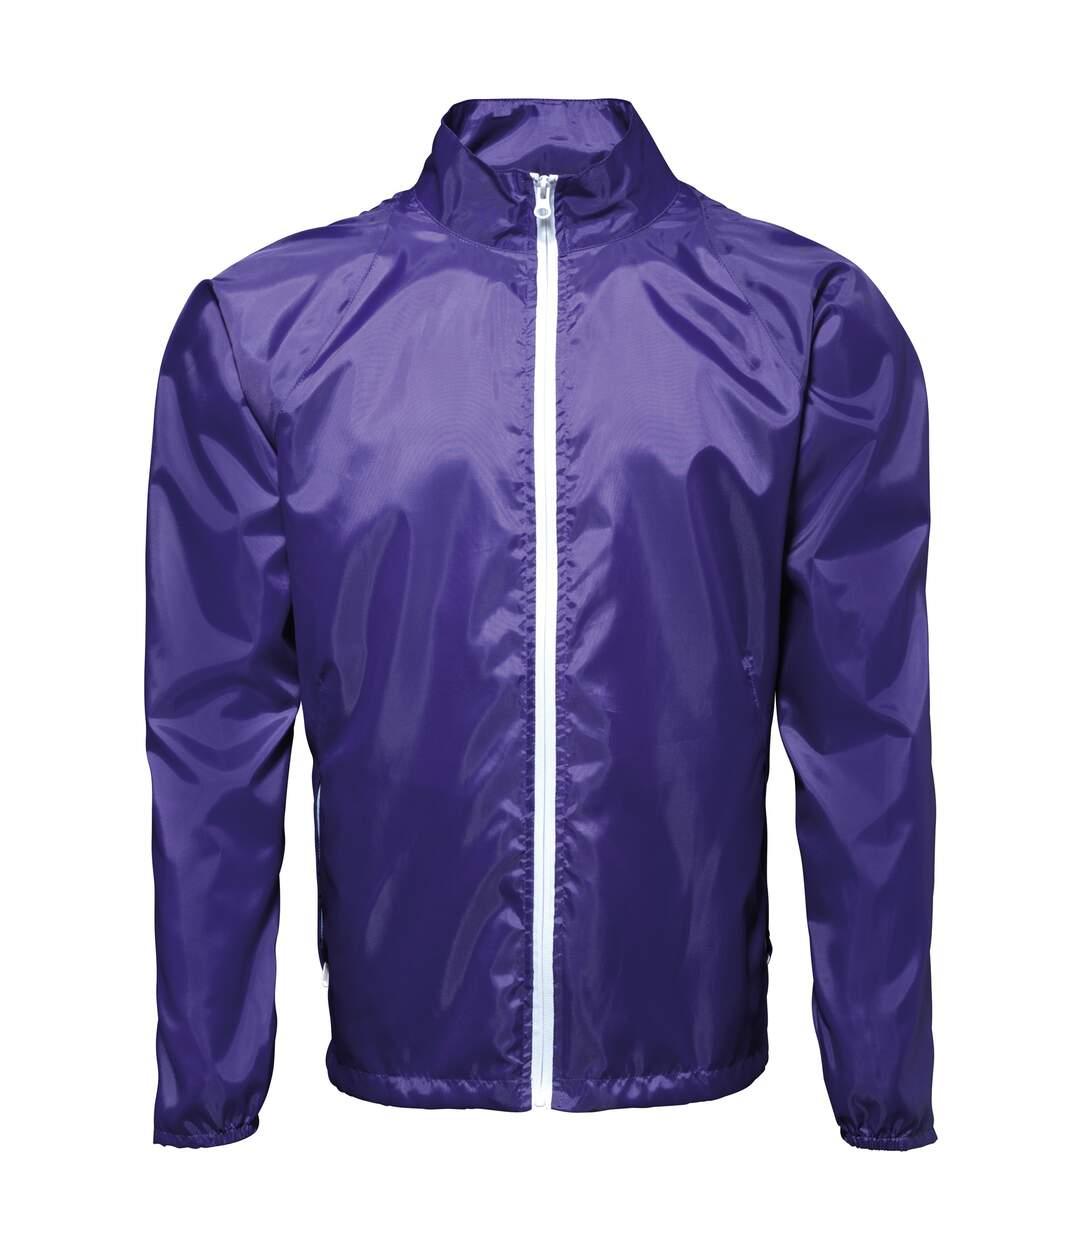 2786 Mens Contrast Lightweight Windcheater Shower Proof Jacket (Pack of 2) (Purple/ White) - UTRW7001